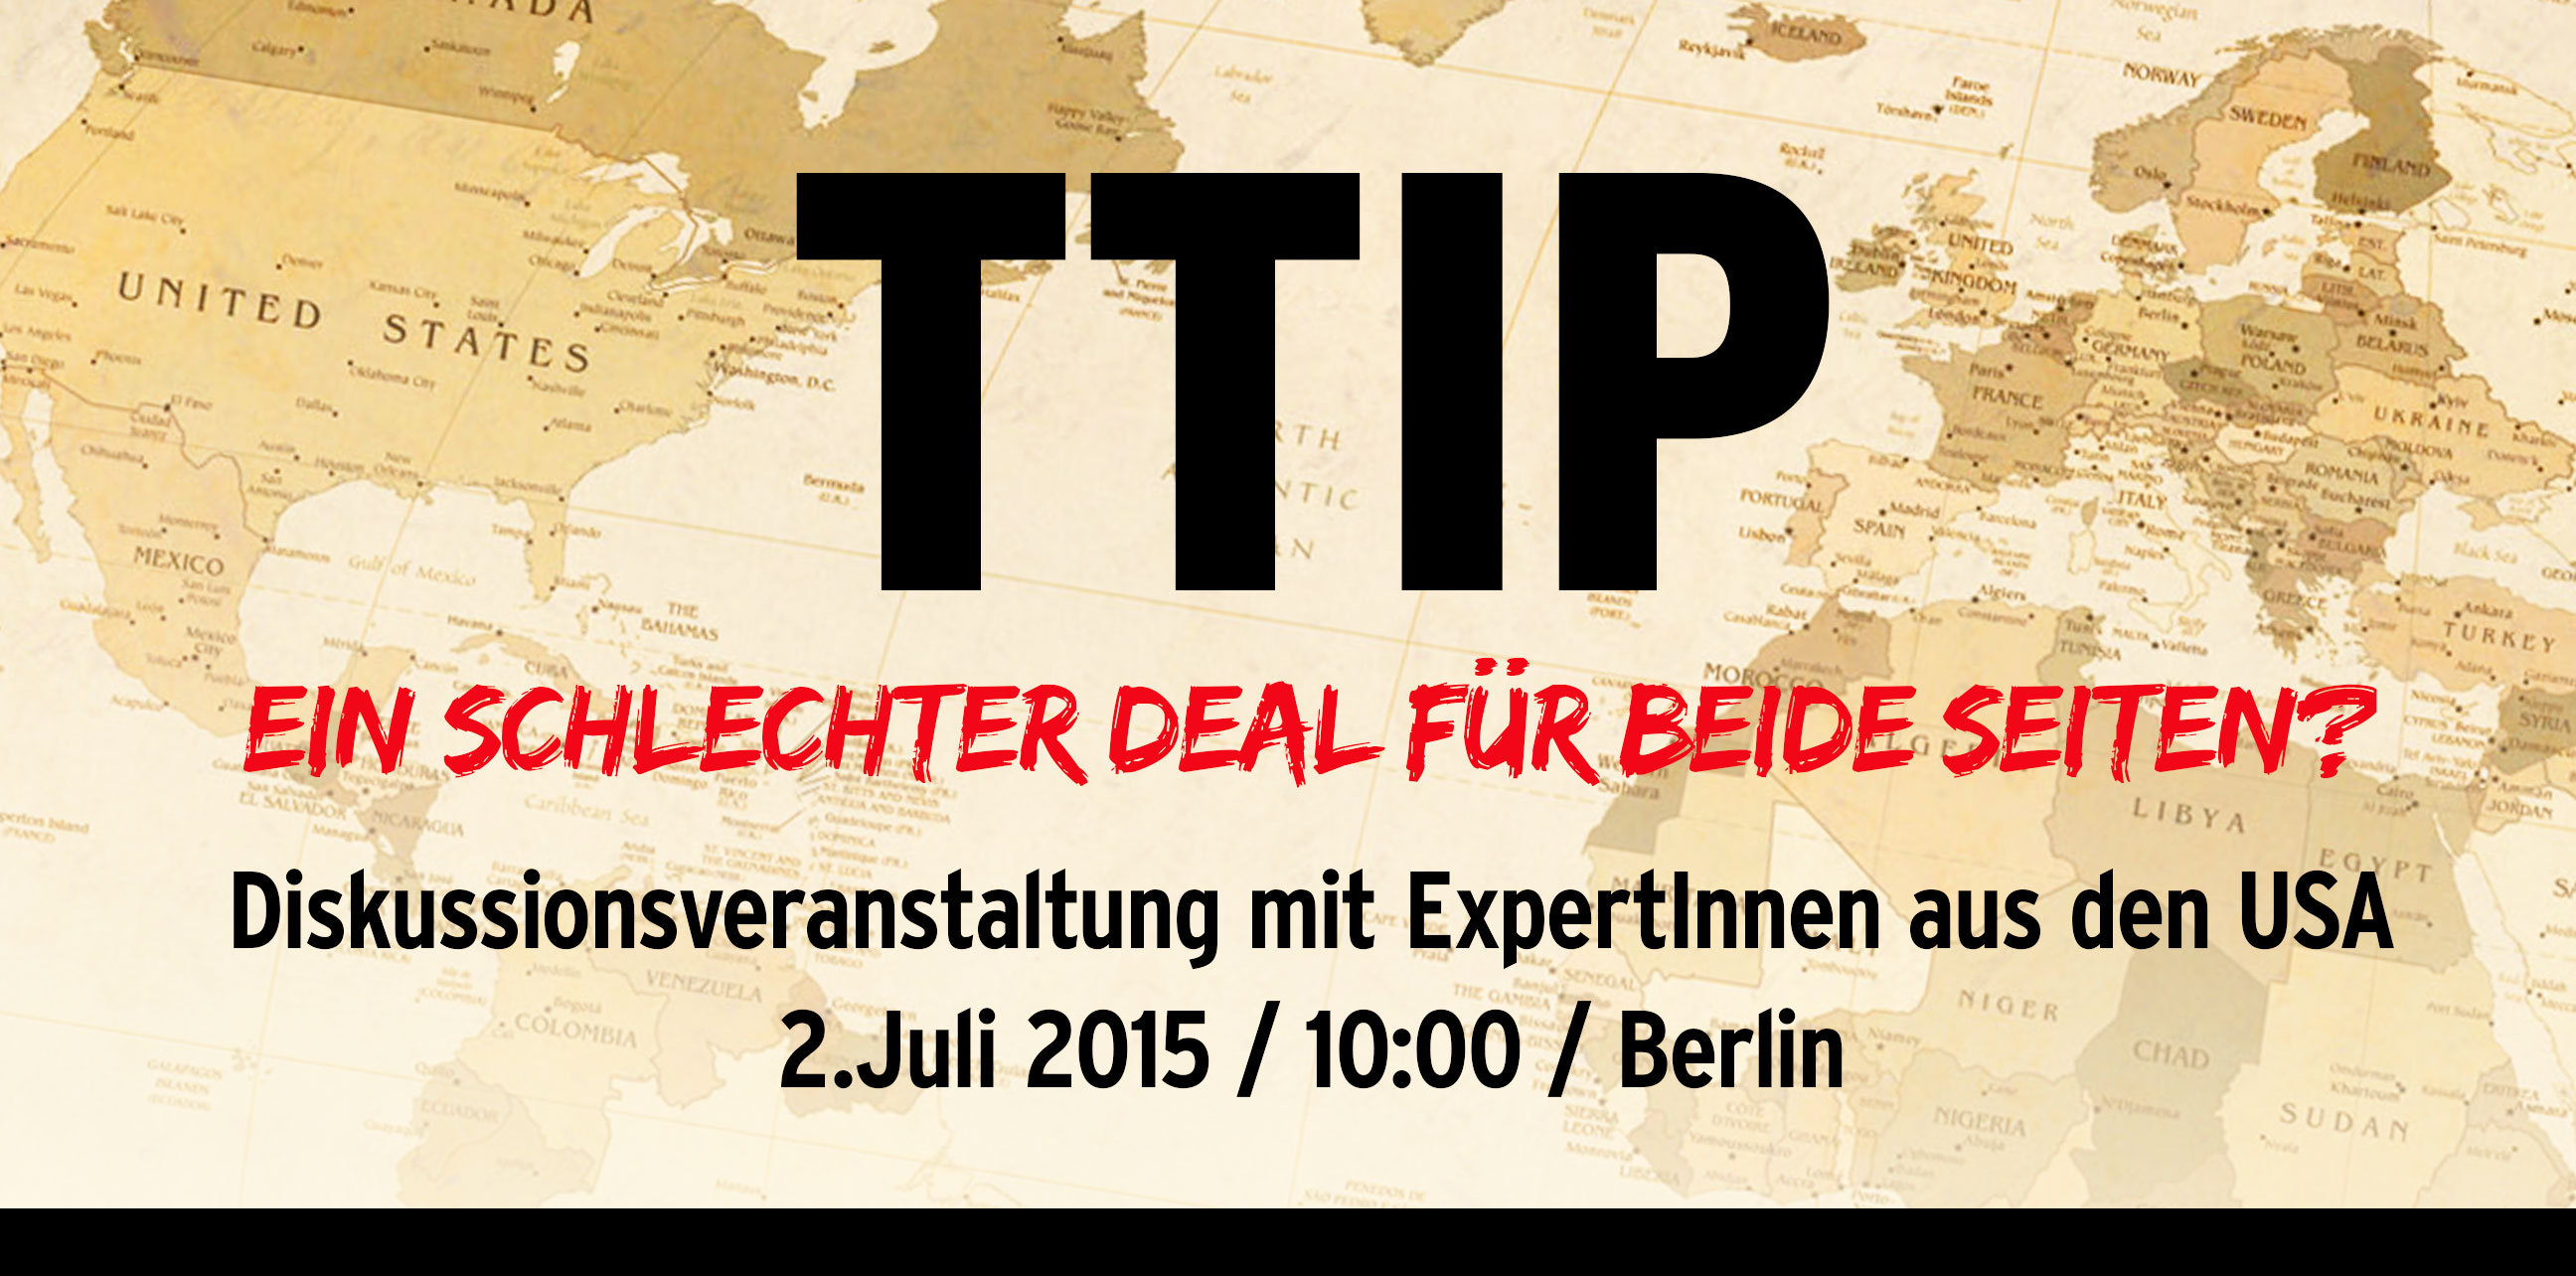 ttip_discussion_berlin_de2